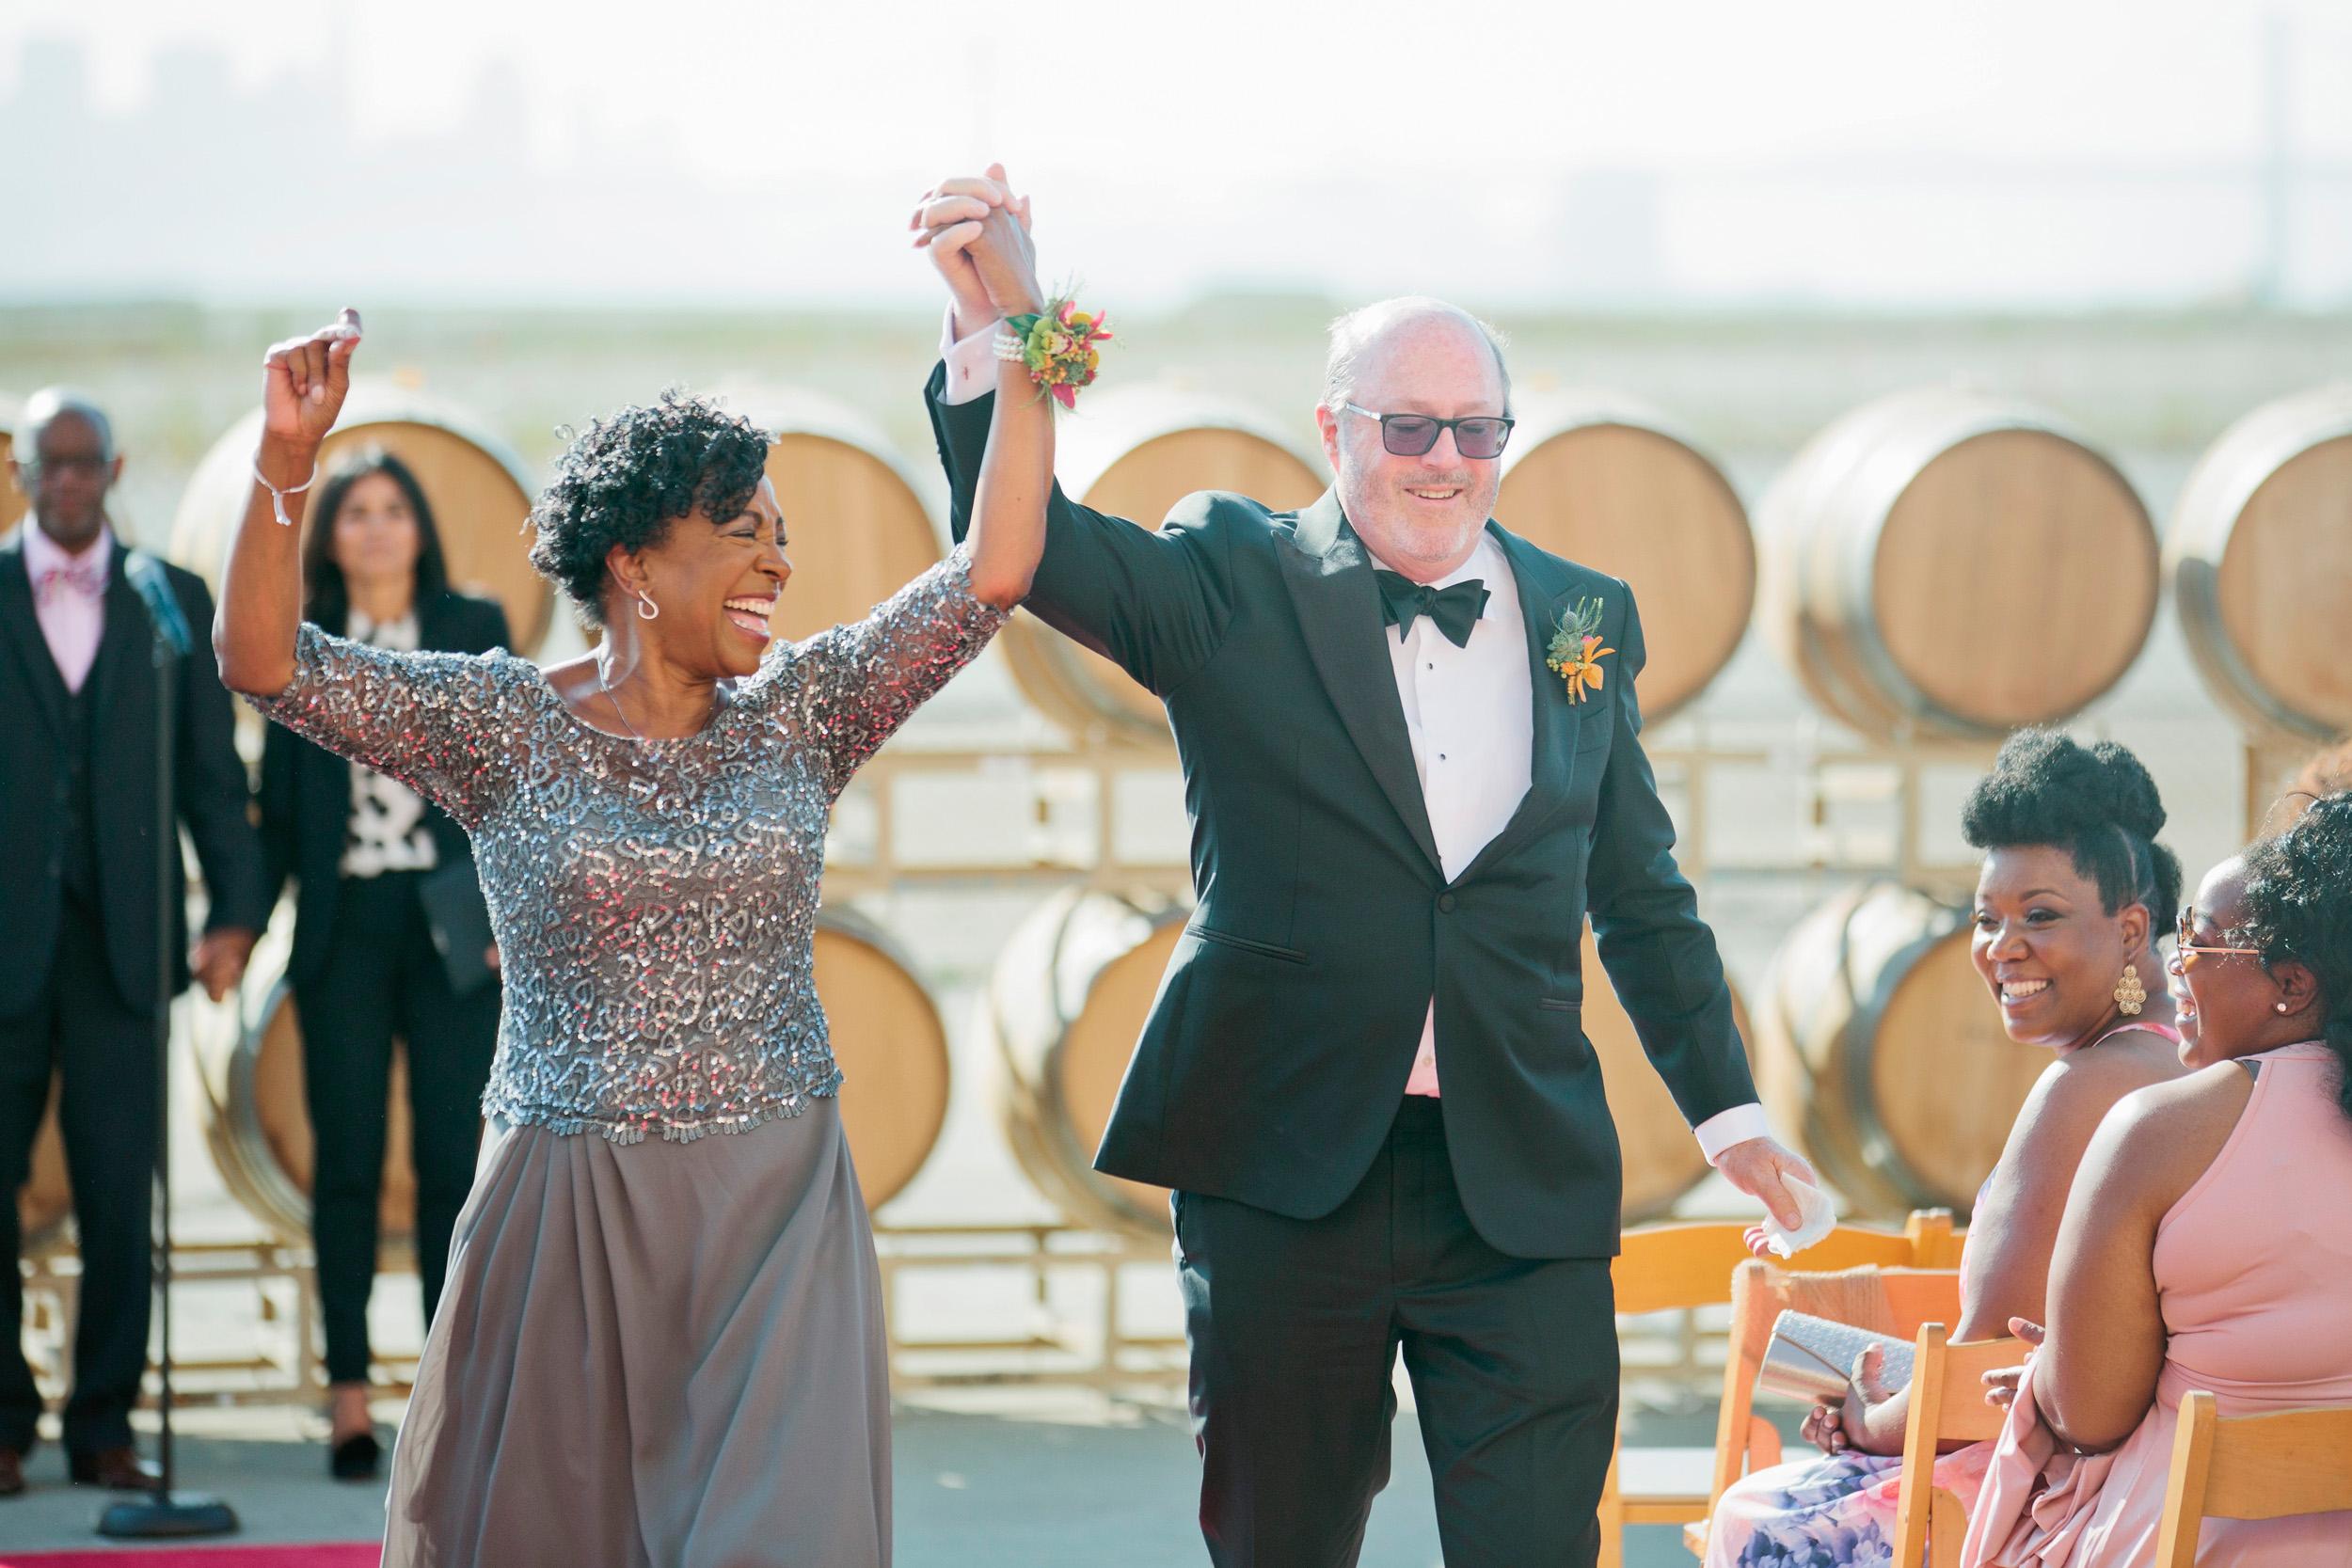 Alameda-Rockwall-Winery-Wedding-034.JPG